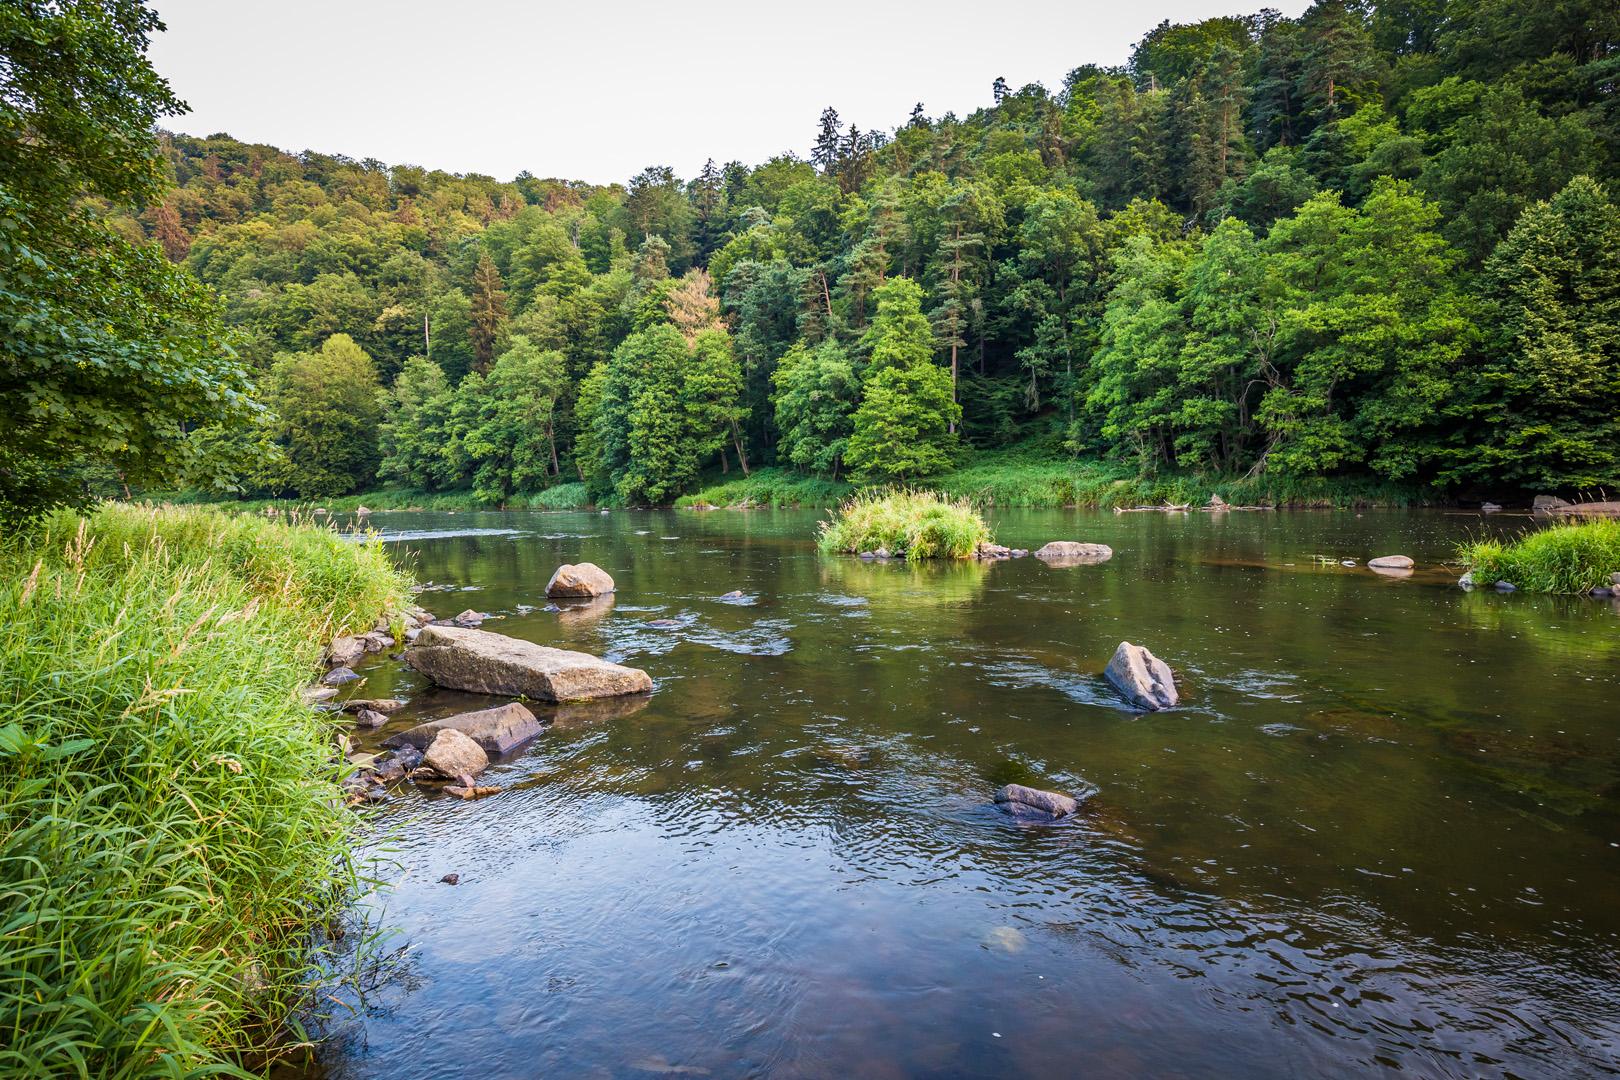 Natur im Oberpfälzer Seenland | © Thomas Kujat